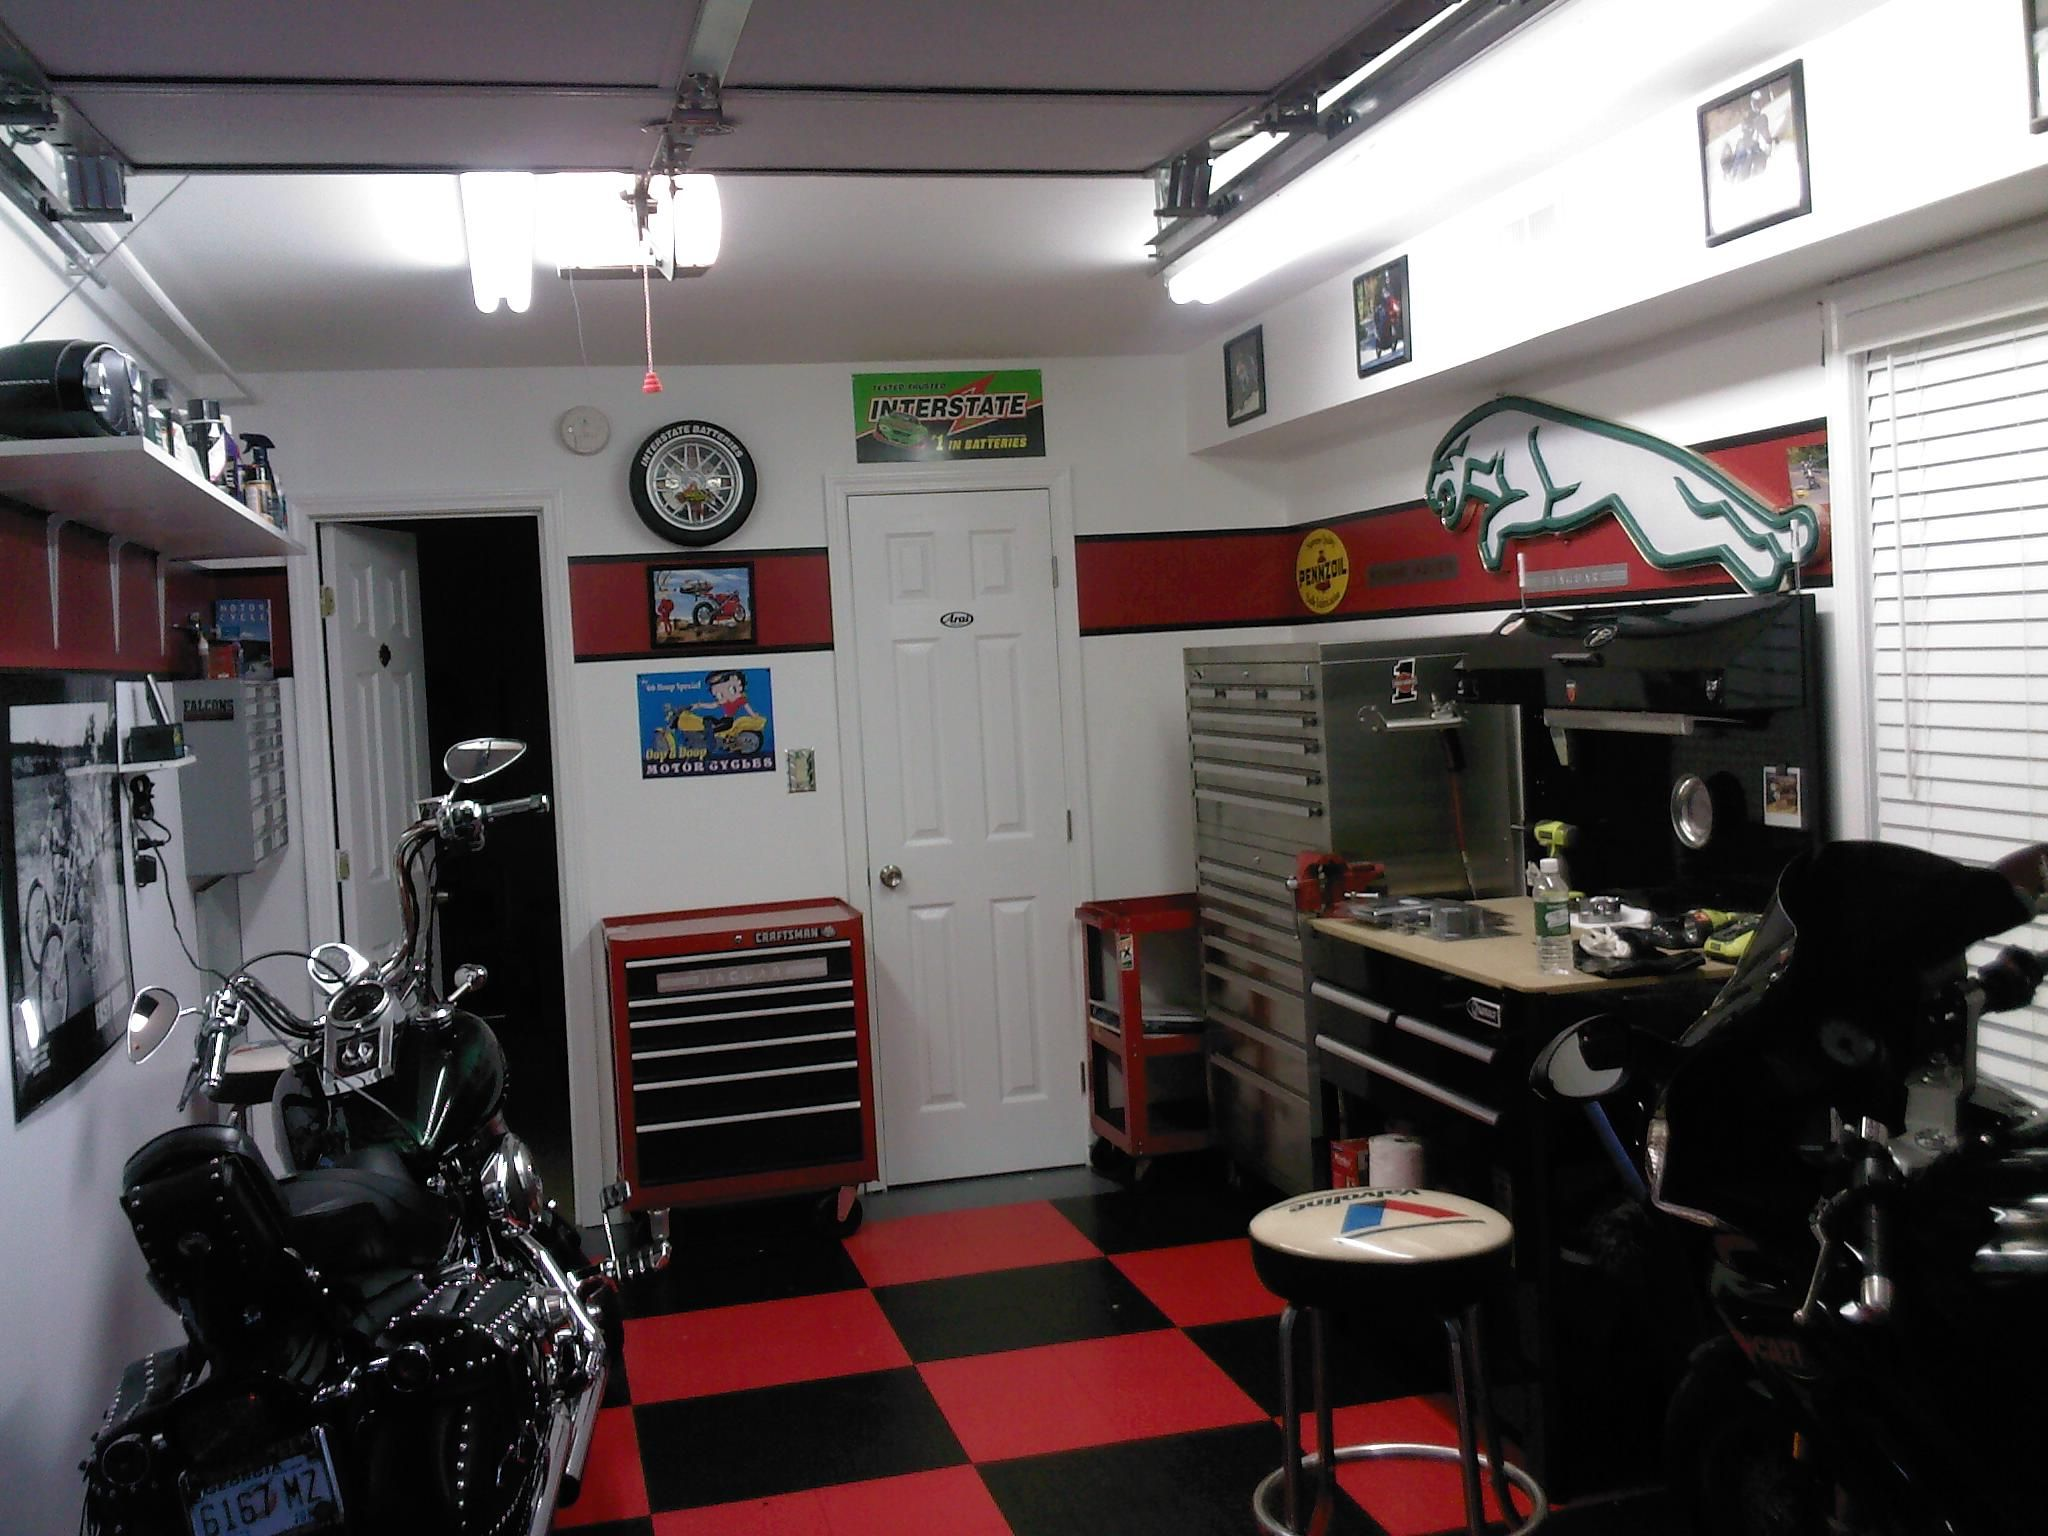 1 Car Garage Workshop Ideas Google Search Workshop Man Cave Pinterest Garage Workshop